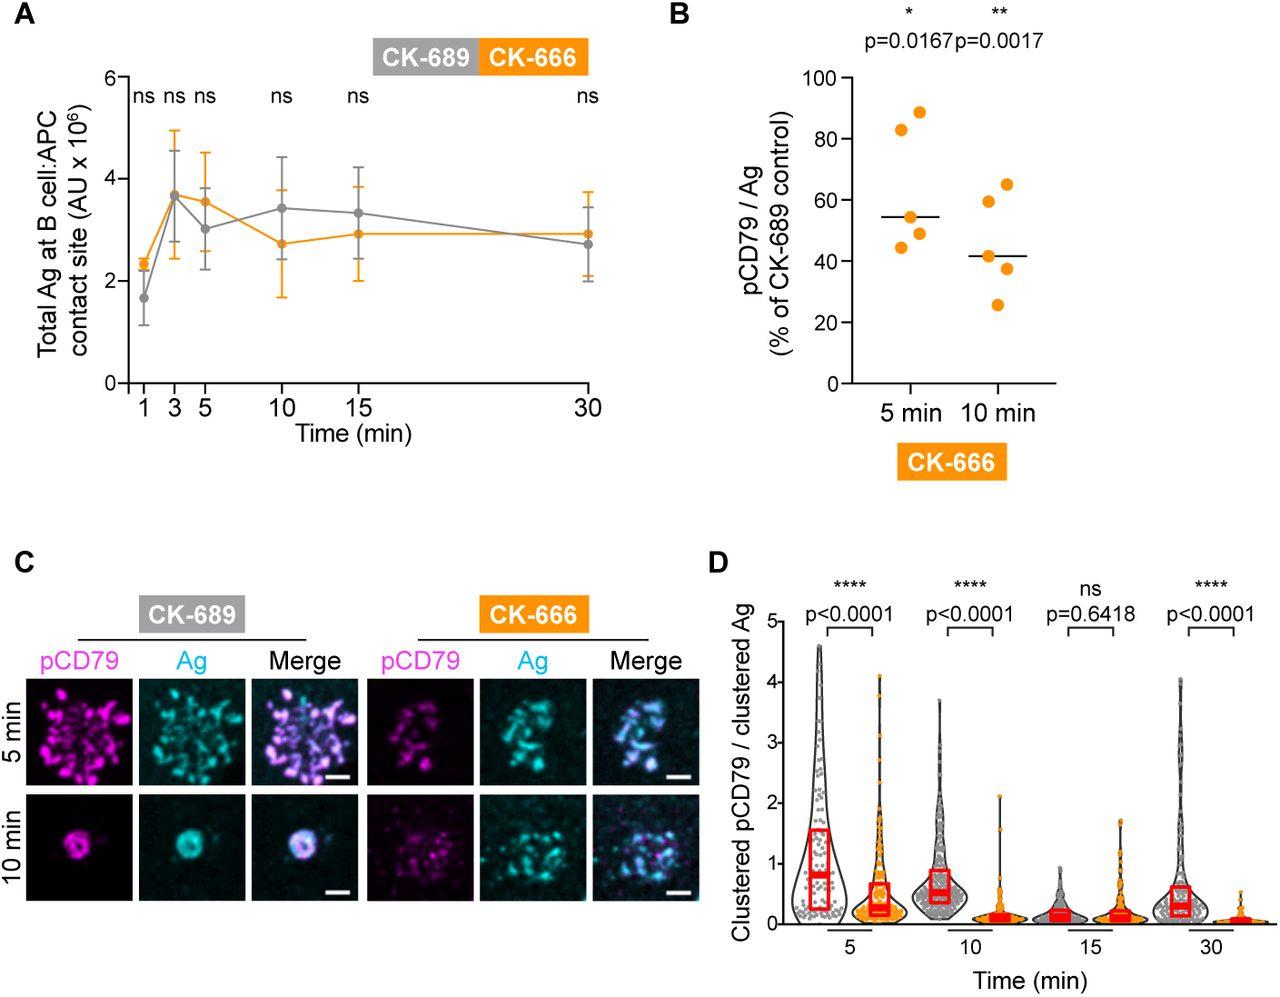 Arp2/3 complex-driven spatial patterning of the BCR enhances